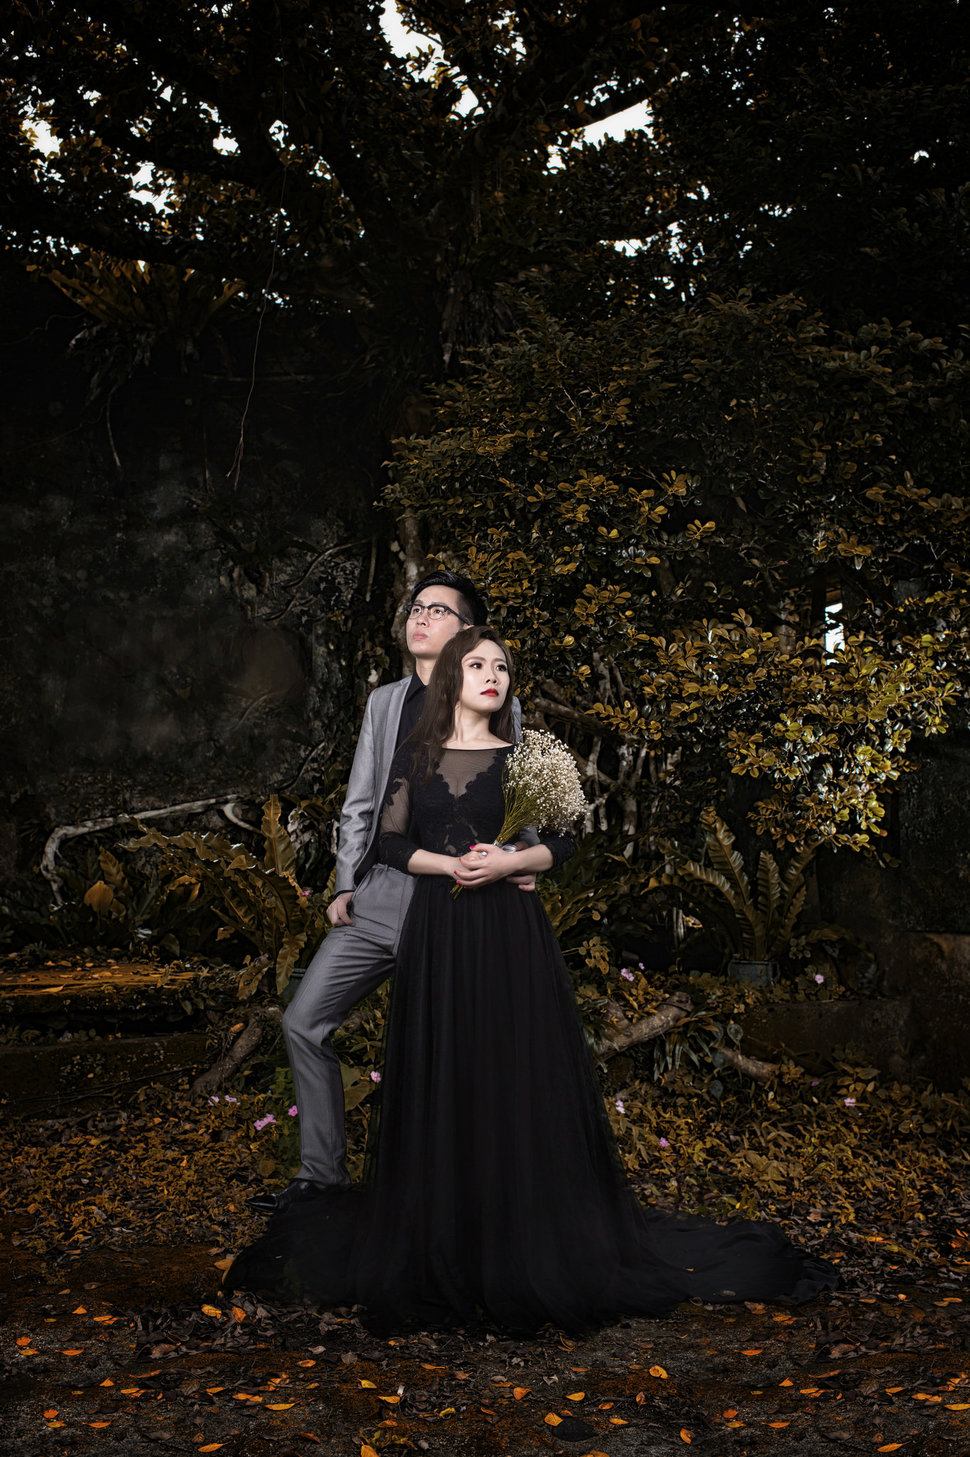 [自助婚紗]Lewis & Demi @蘭嶼(編號:469744) - J&E Image Studio - 結婚吧